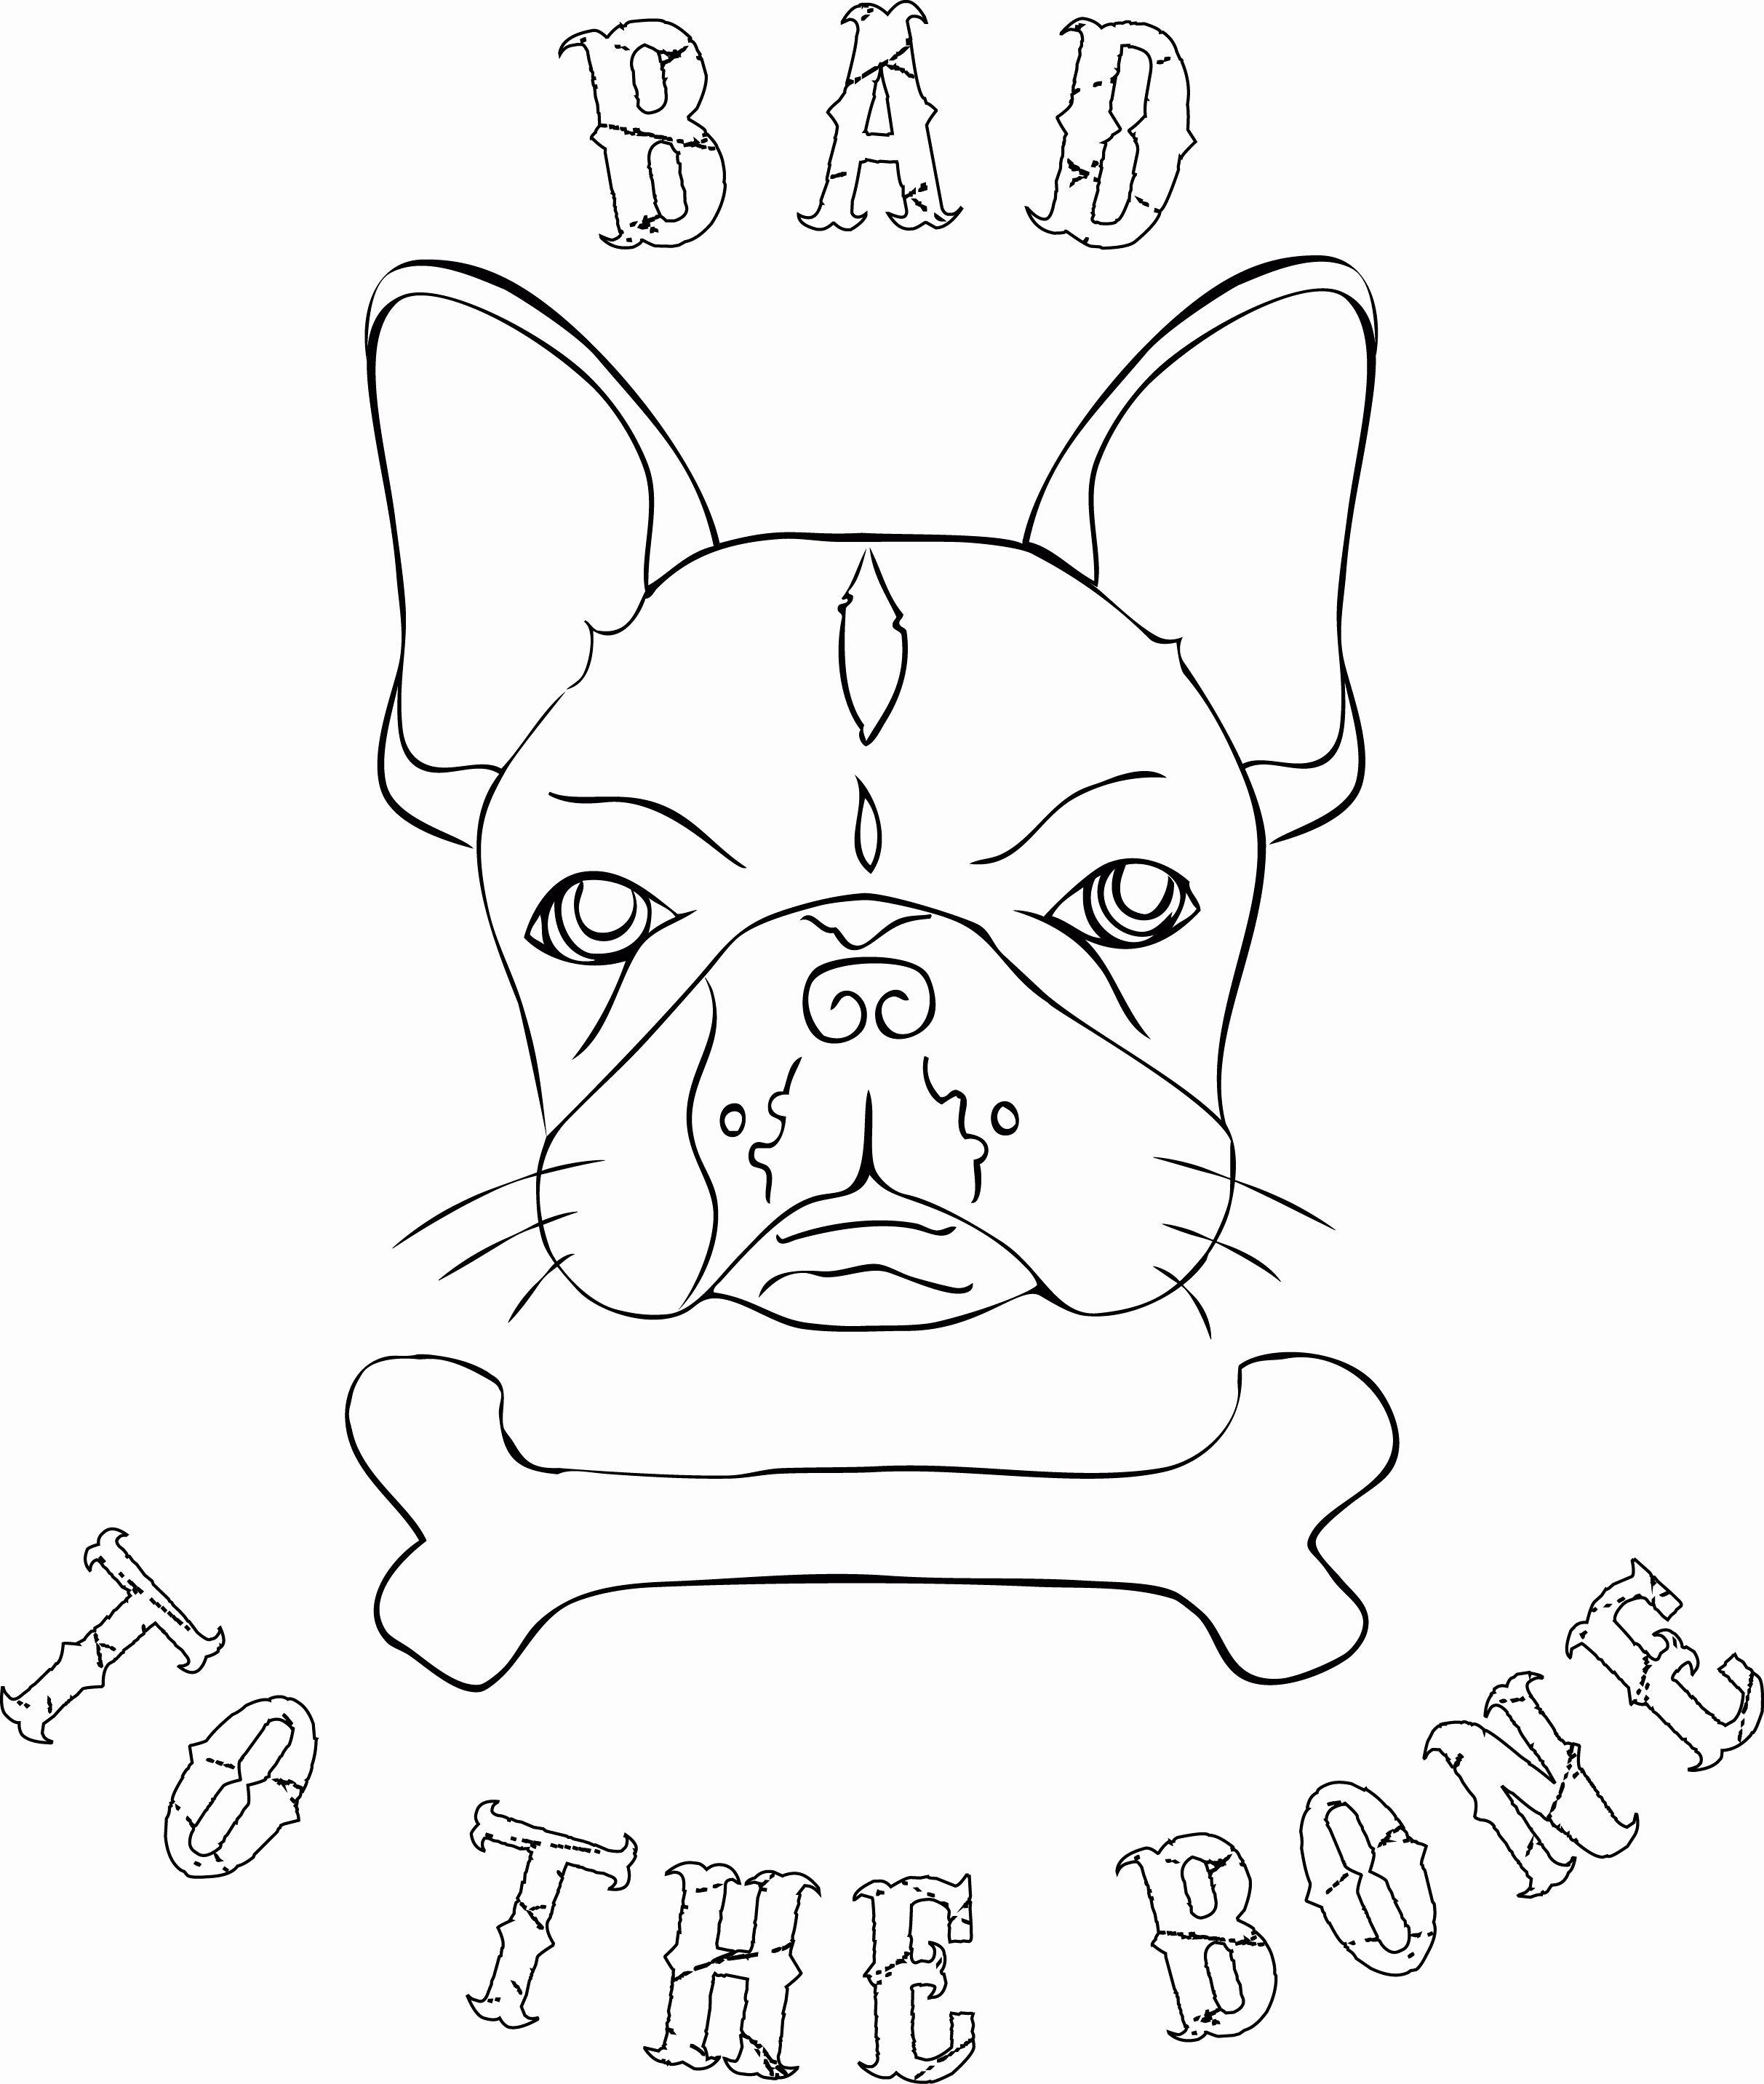 Bull Dog Coloring Page Fresh Bulldog Coloring Pages